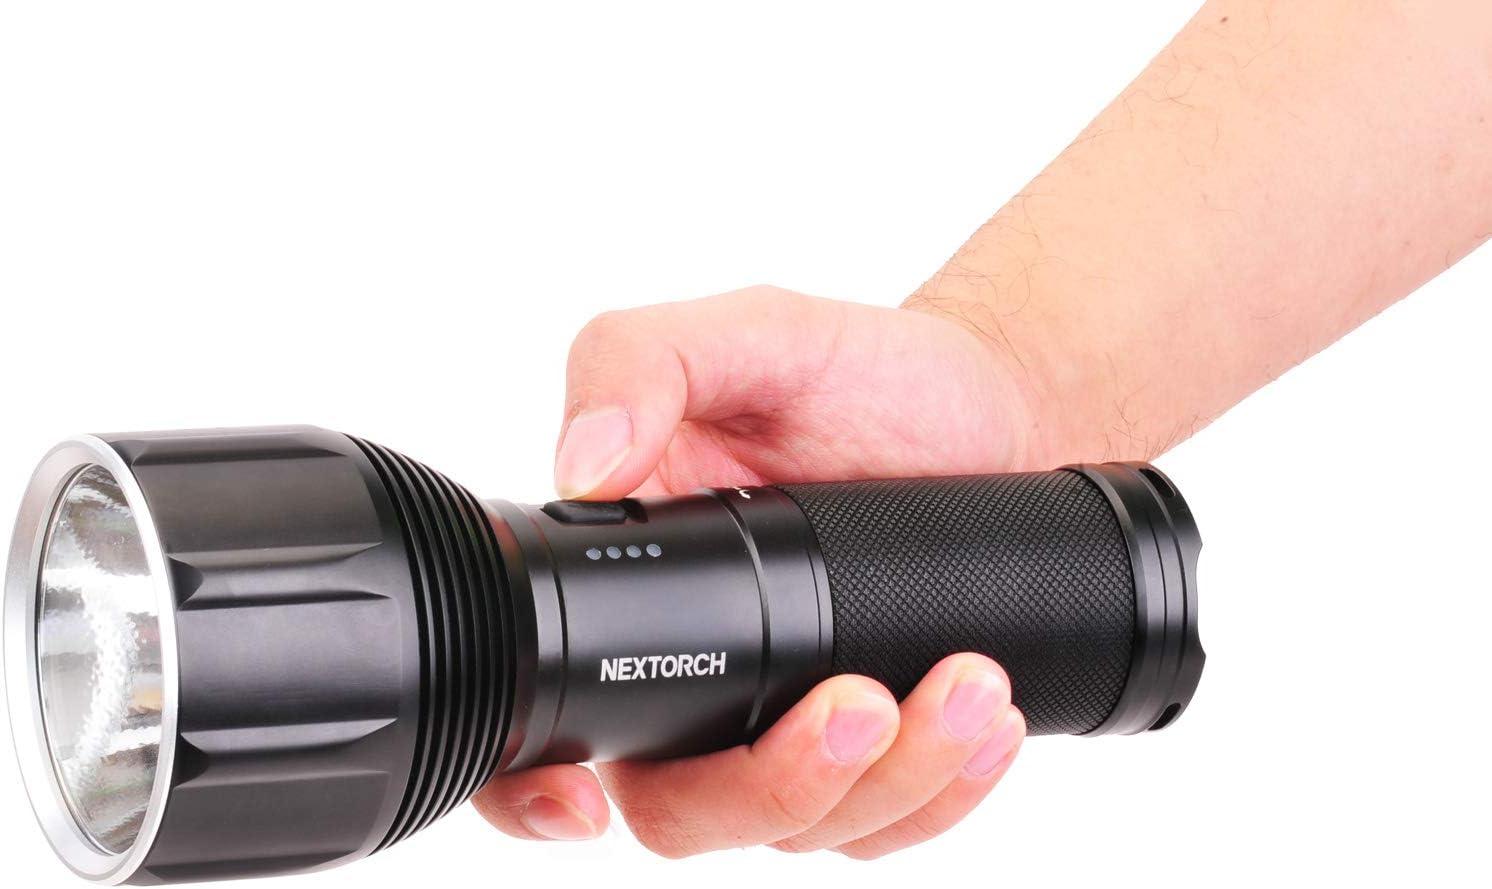 Negro 212 x 50 x 83 mm NEXTORCH Saint Torch 11 Linterna